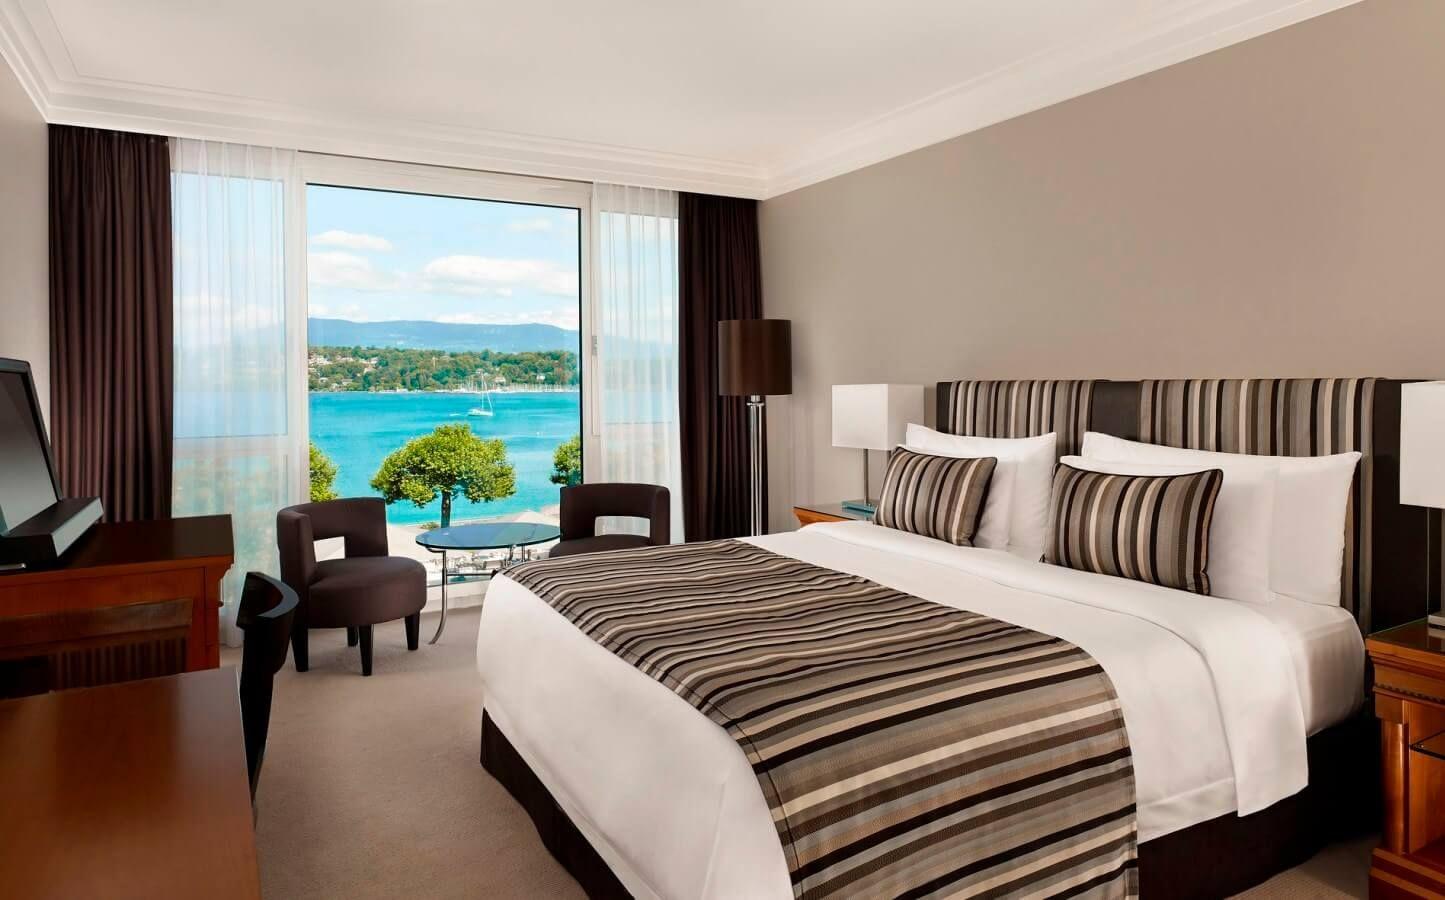 Chambre Luxe Hotel DY72  Jornalagora